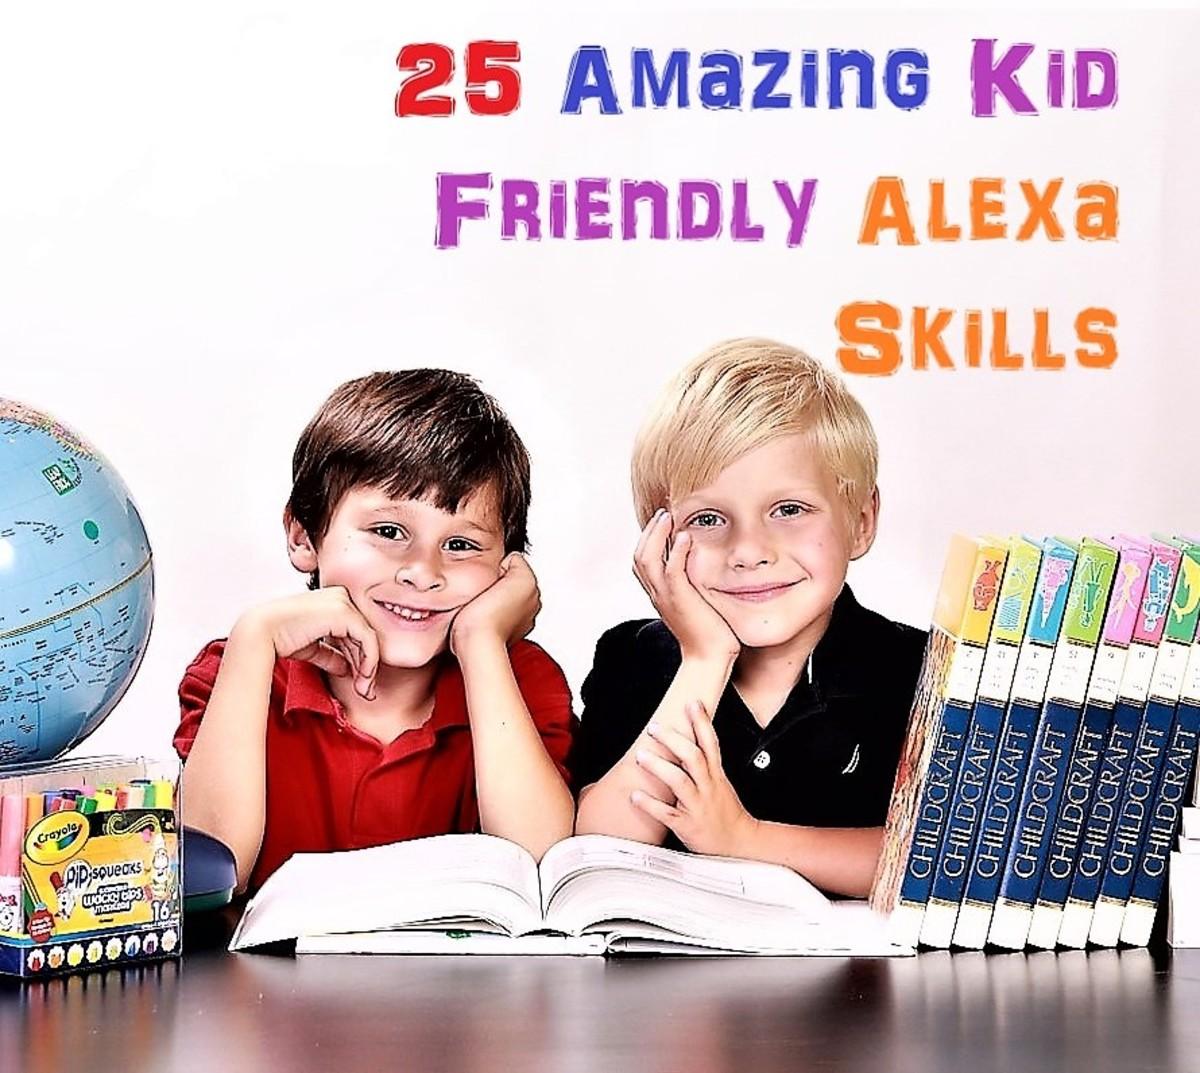 25 Amazing Kid Friendly Alexa Skills